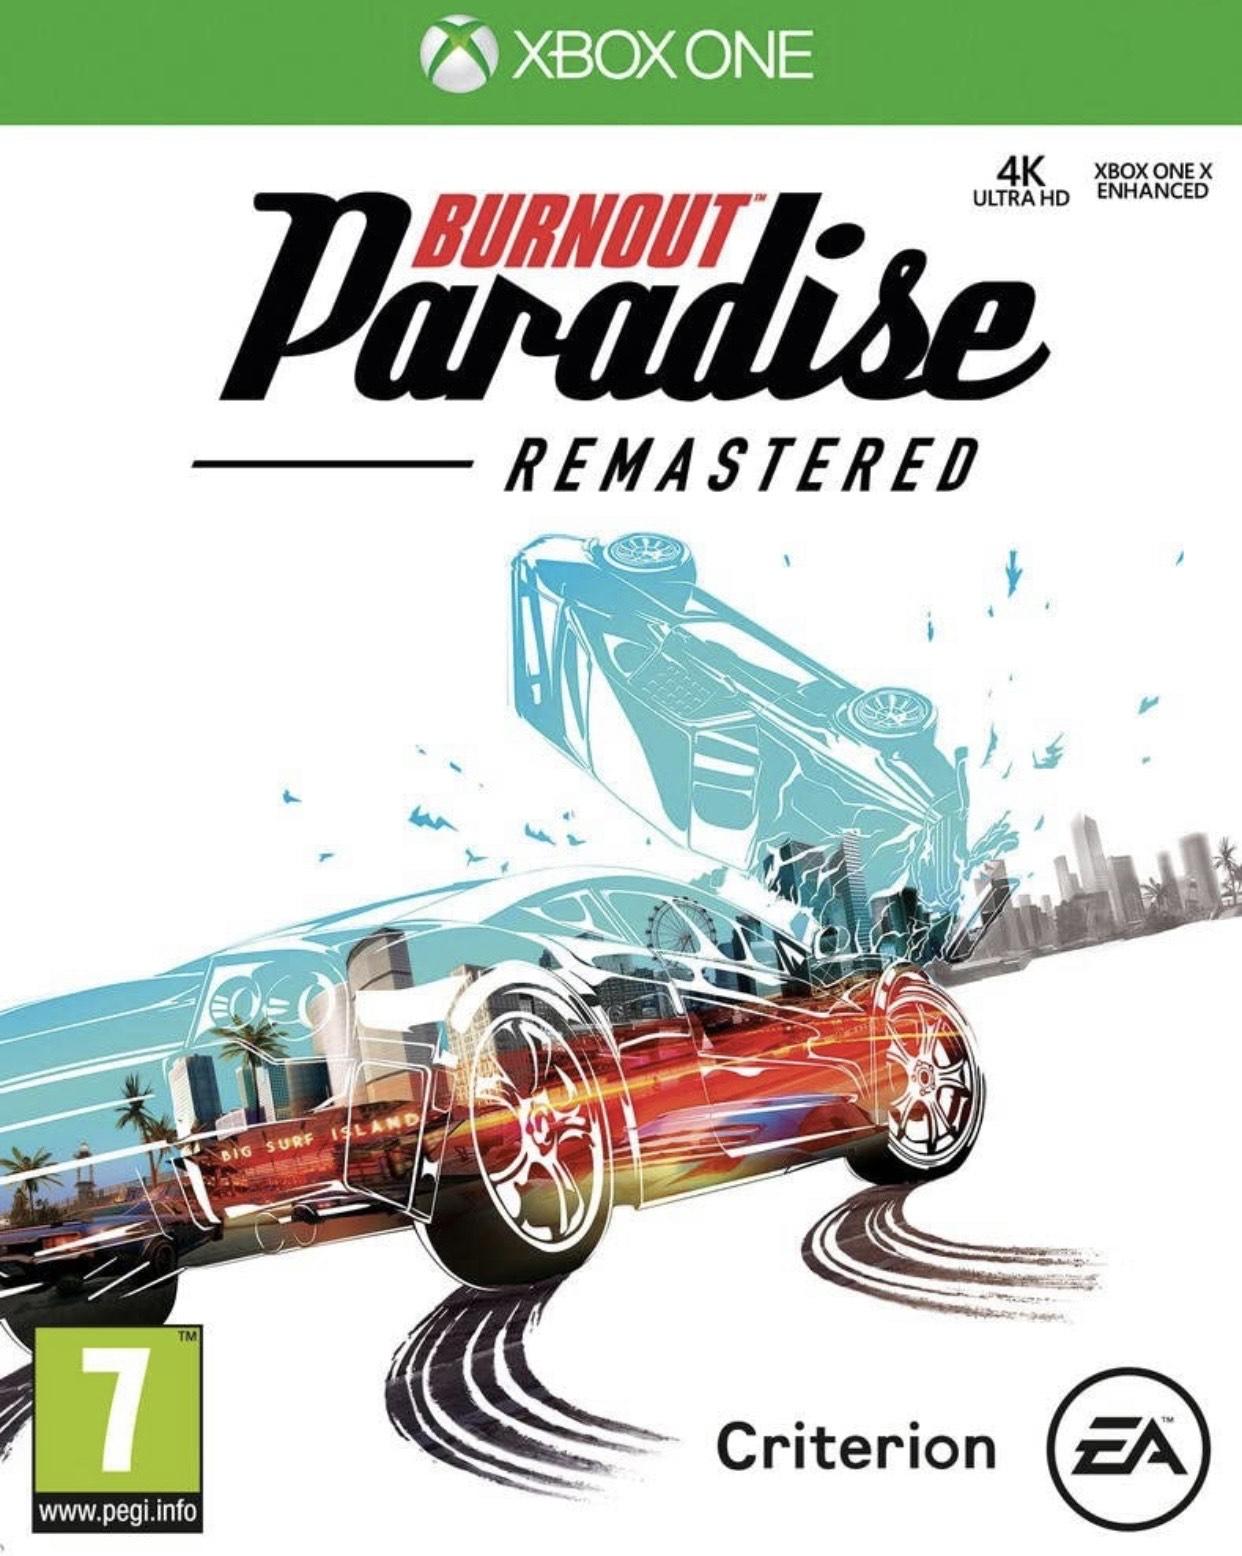 Burnout Paradise Remastered £4.99 @ Microsoft store